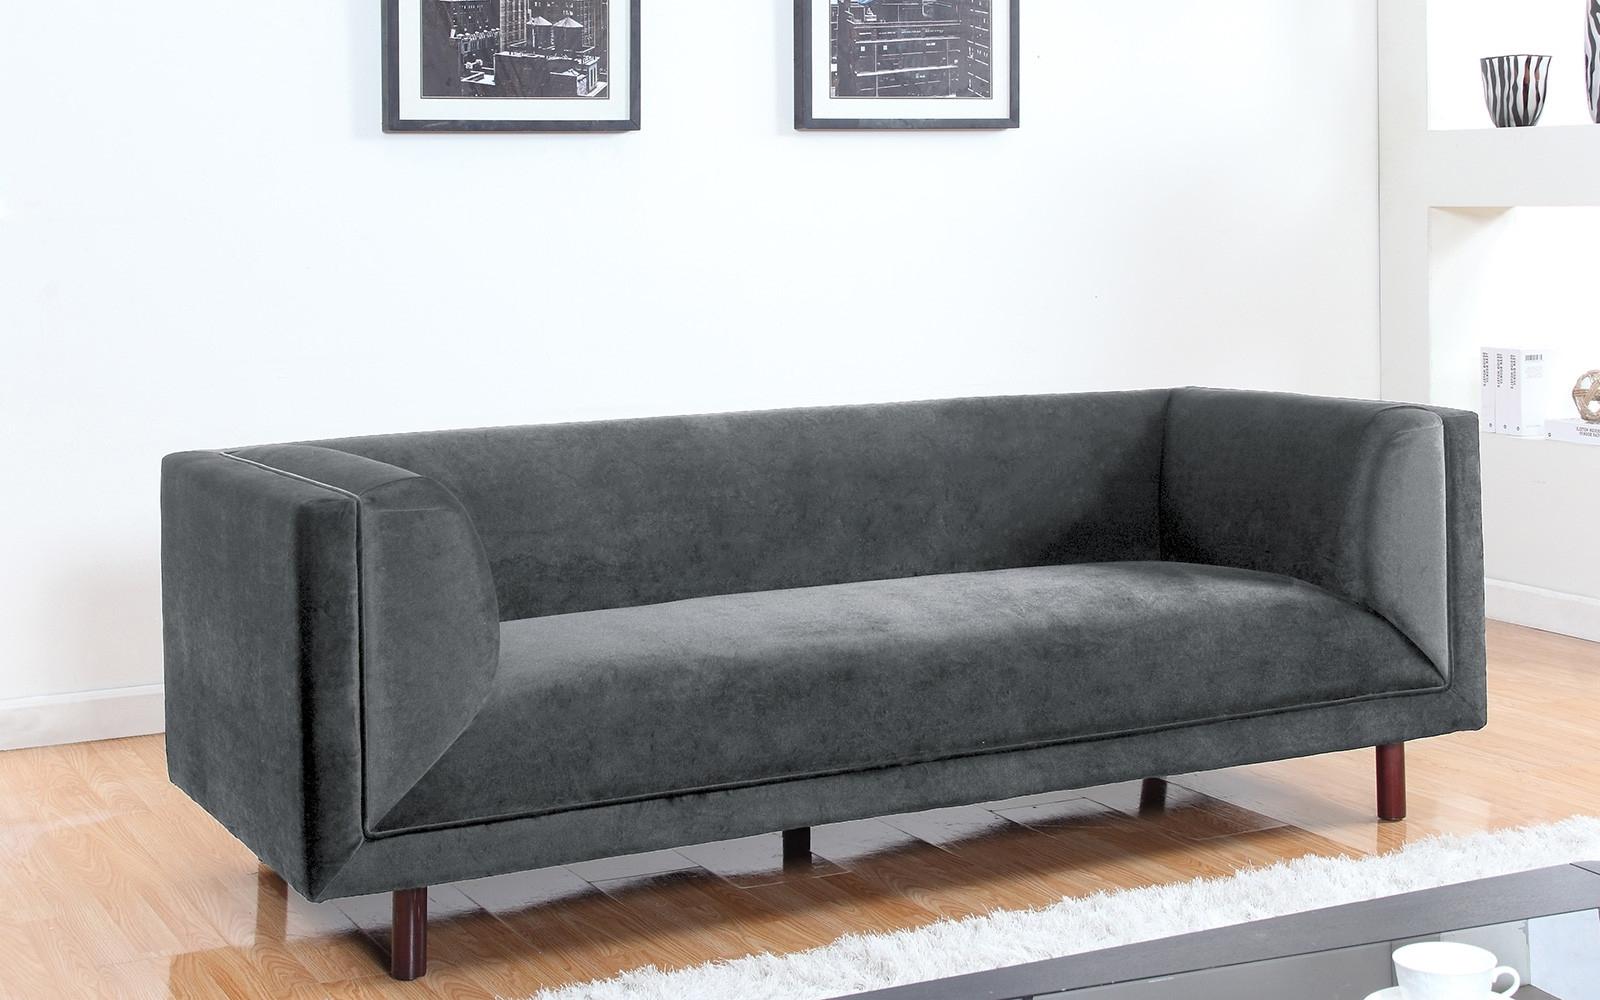 Modern 3 Seater Sofas Intended For Preferred Modern Contemporary Large 3 Seater Velvet Sofa – Walmart (View 9 of 20)